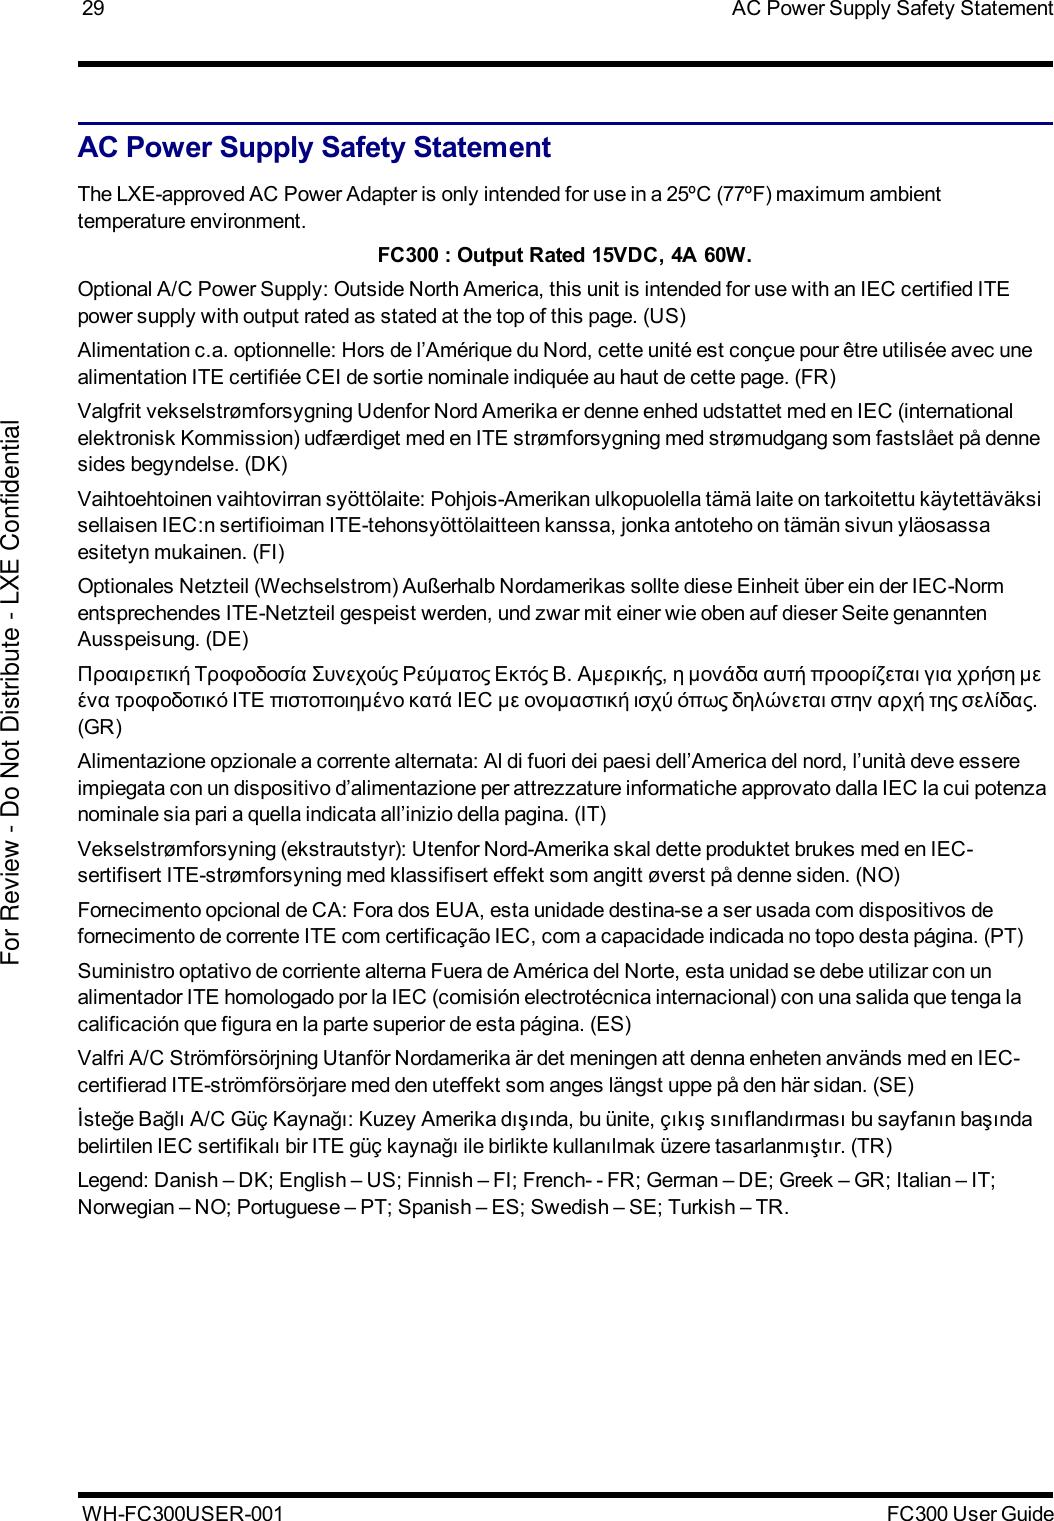 Honeywell lxe4831p mx9 fc300 handheld computer user manual pdf output page 33 of honeywell lxe4831p mx9 fc300 handheld computer user manual pdf output sciox Image collections